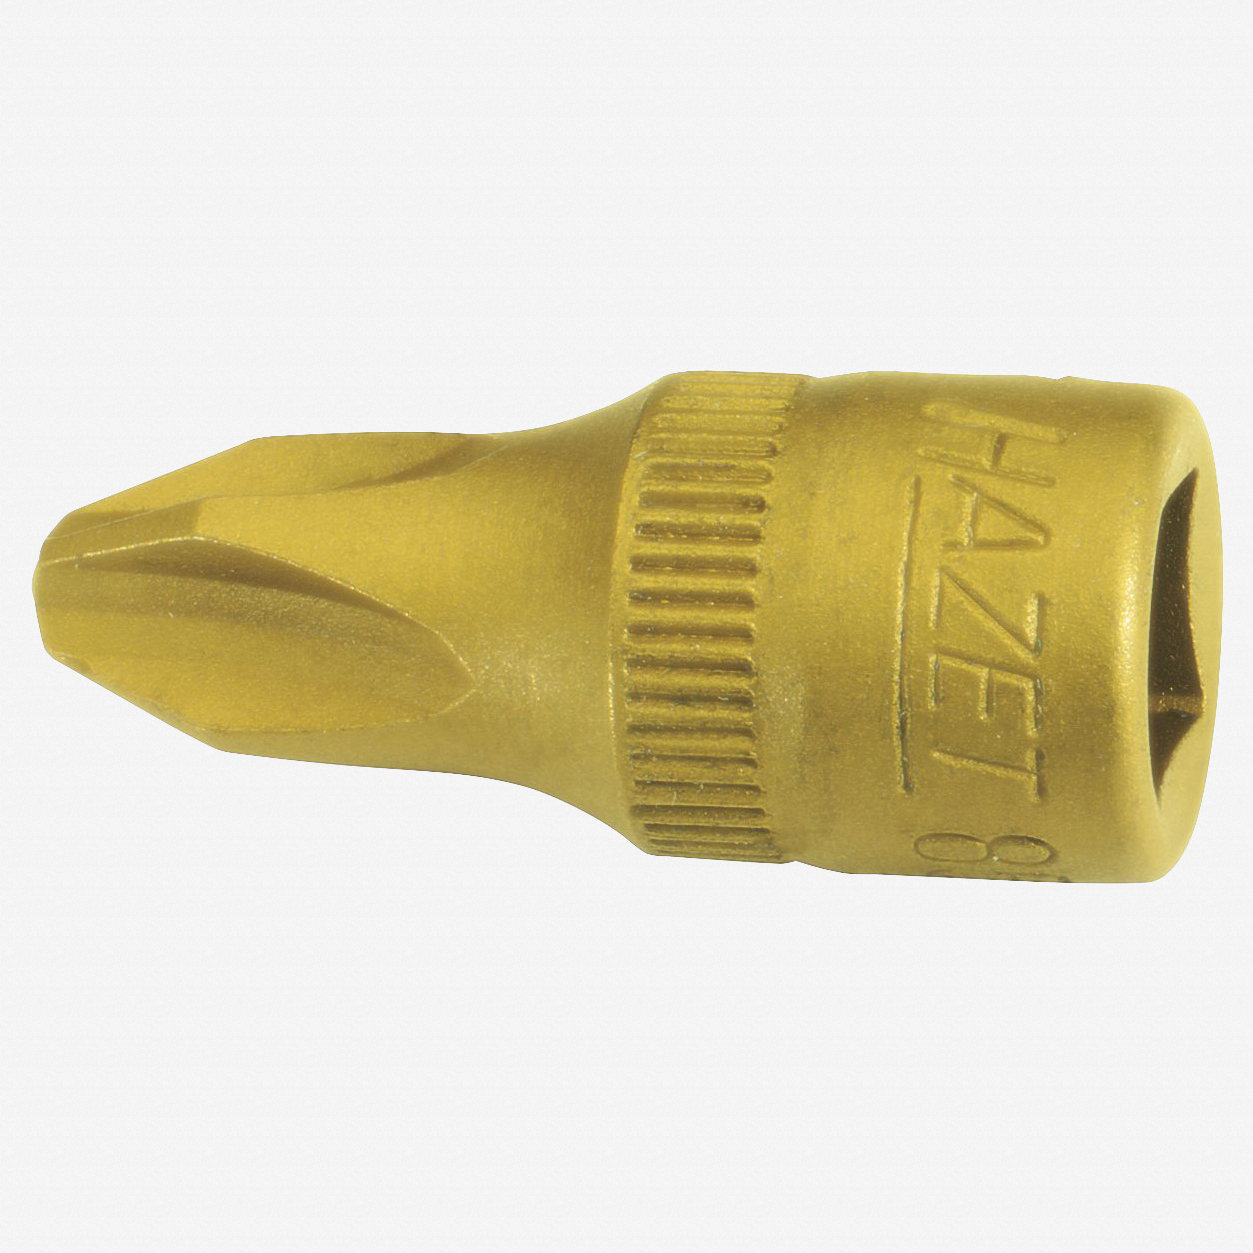 "Hazet 8506-PH3 PH #3 Phillips TiN 1/4"" Socket - KC Tool"